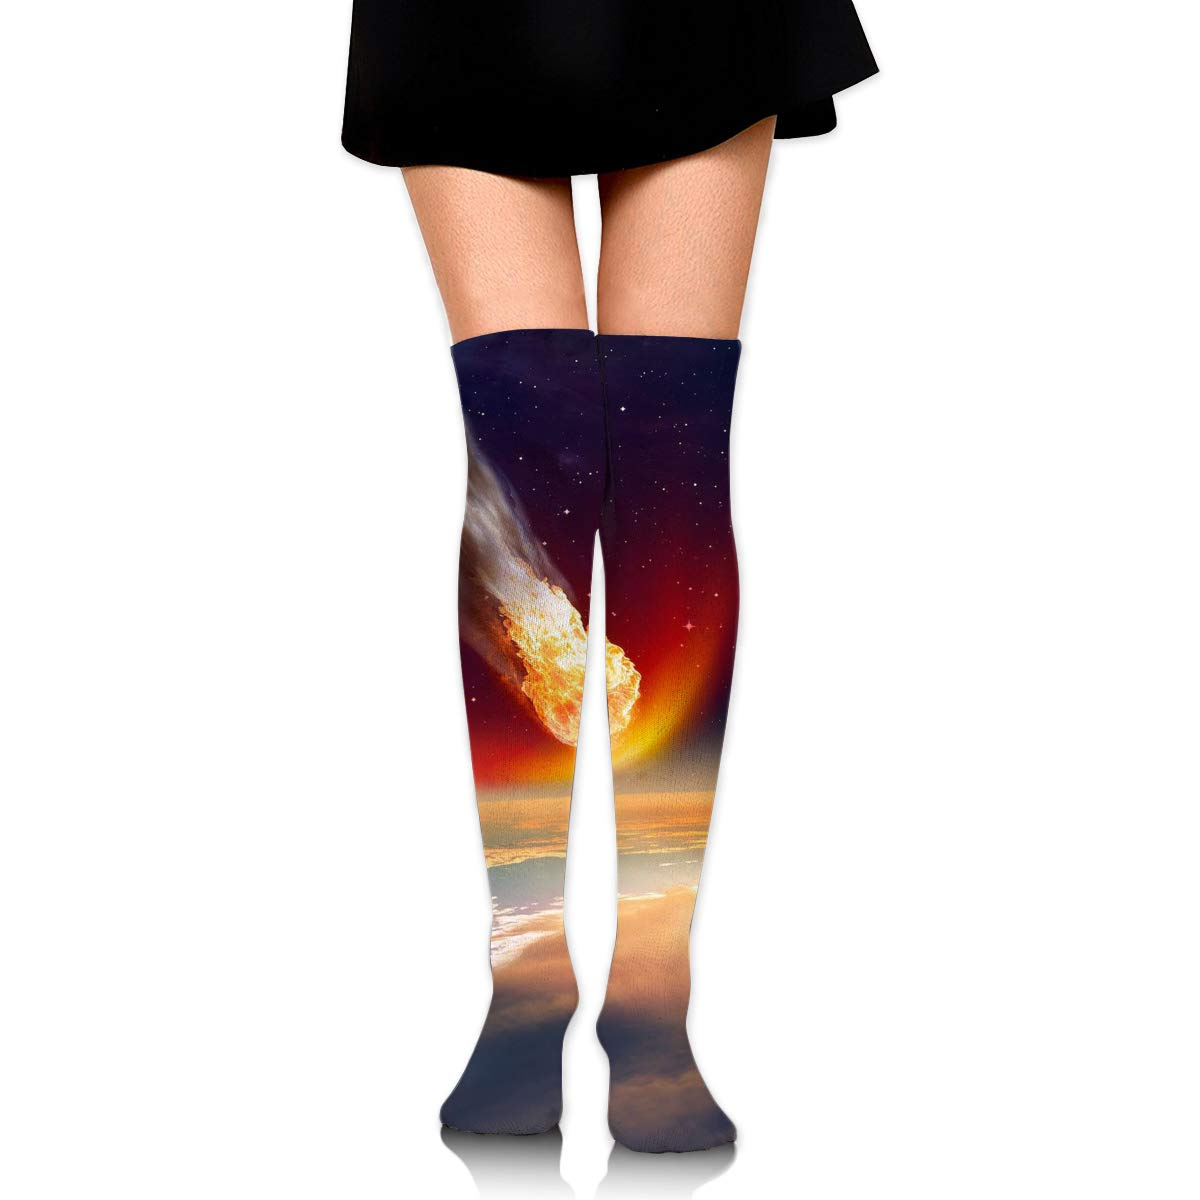 High Elasticity Girl Cotton Knee High Socks Uniform Magic Space Women Tube Socks